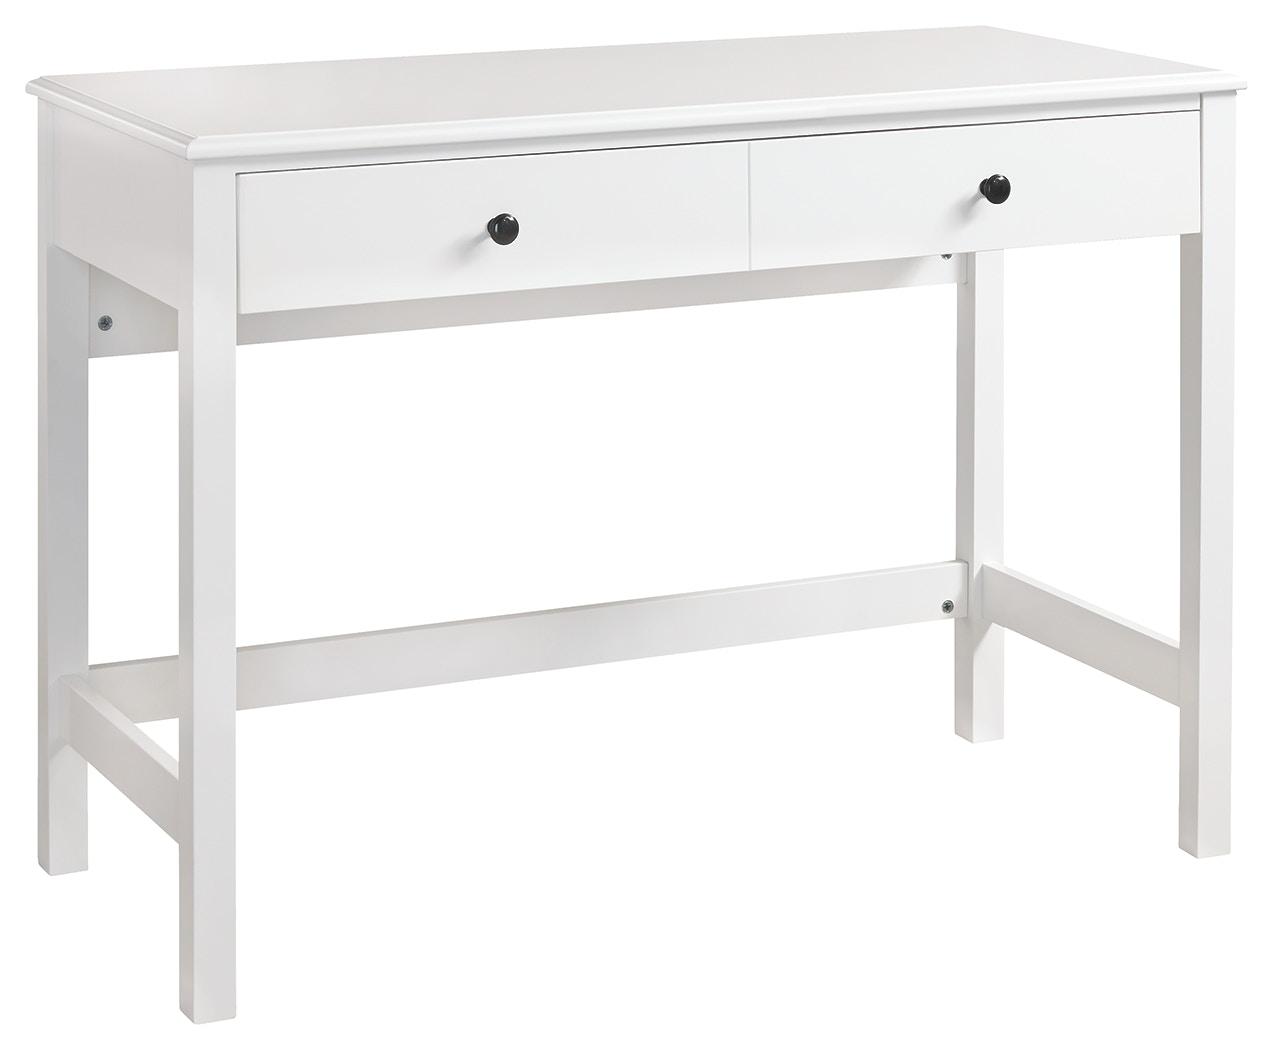 Signature Design by Ashley Othello Home Office Desk Z1611054